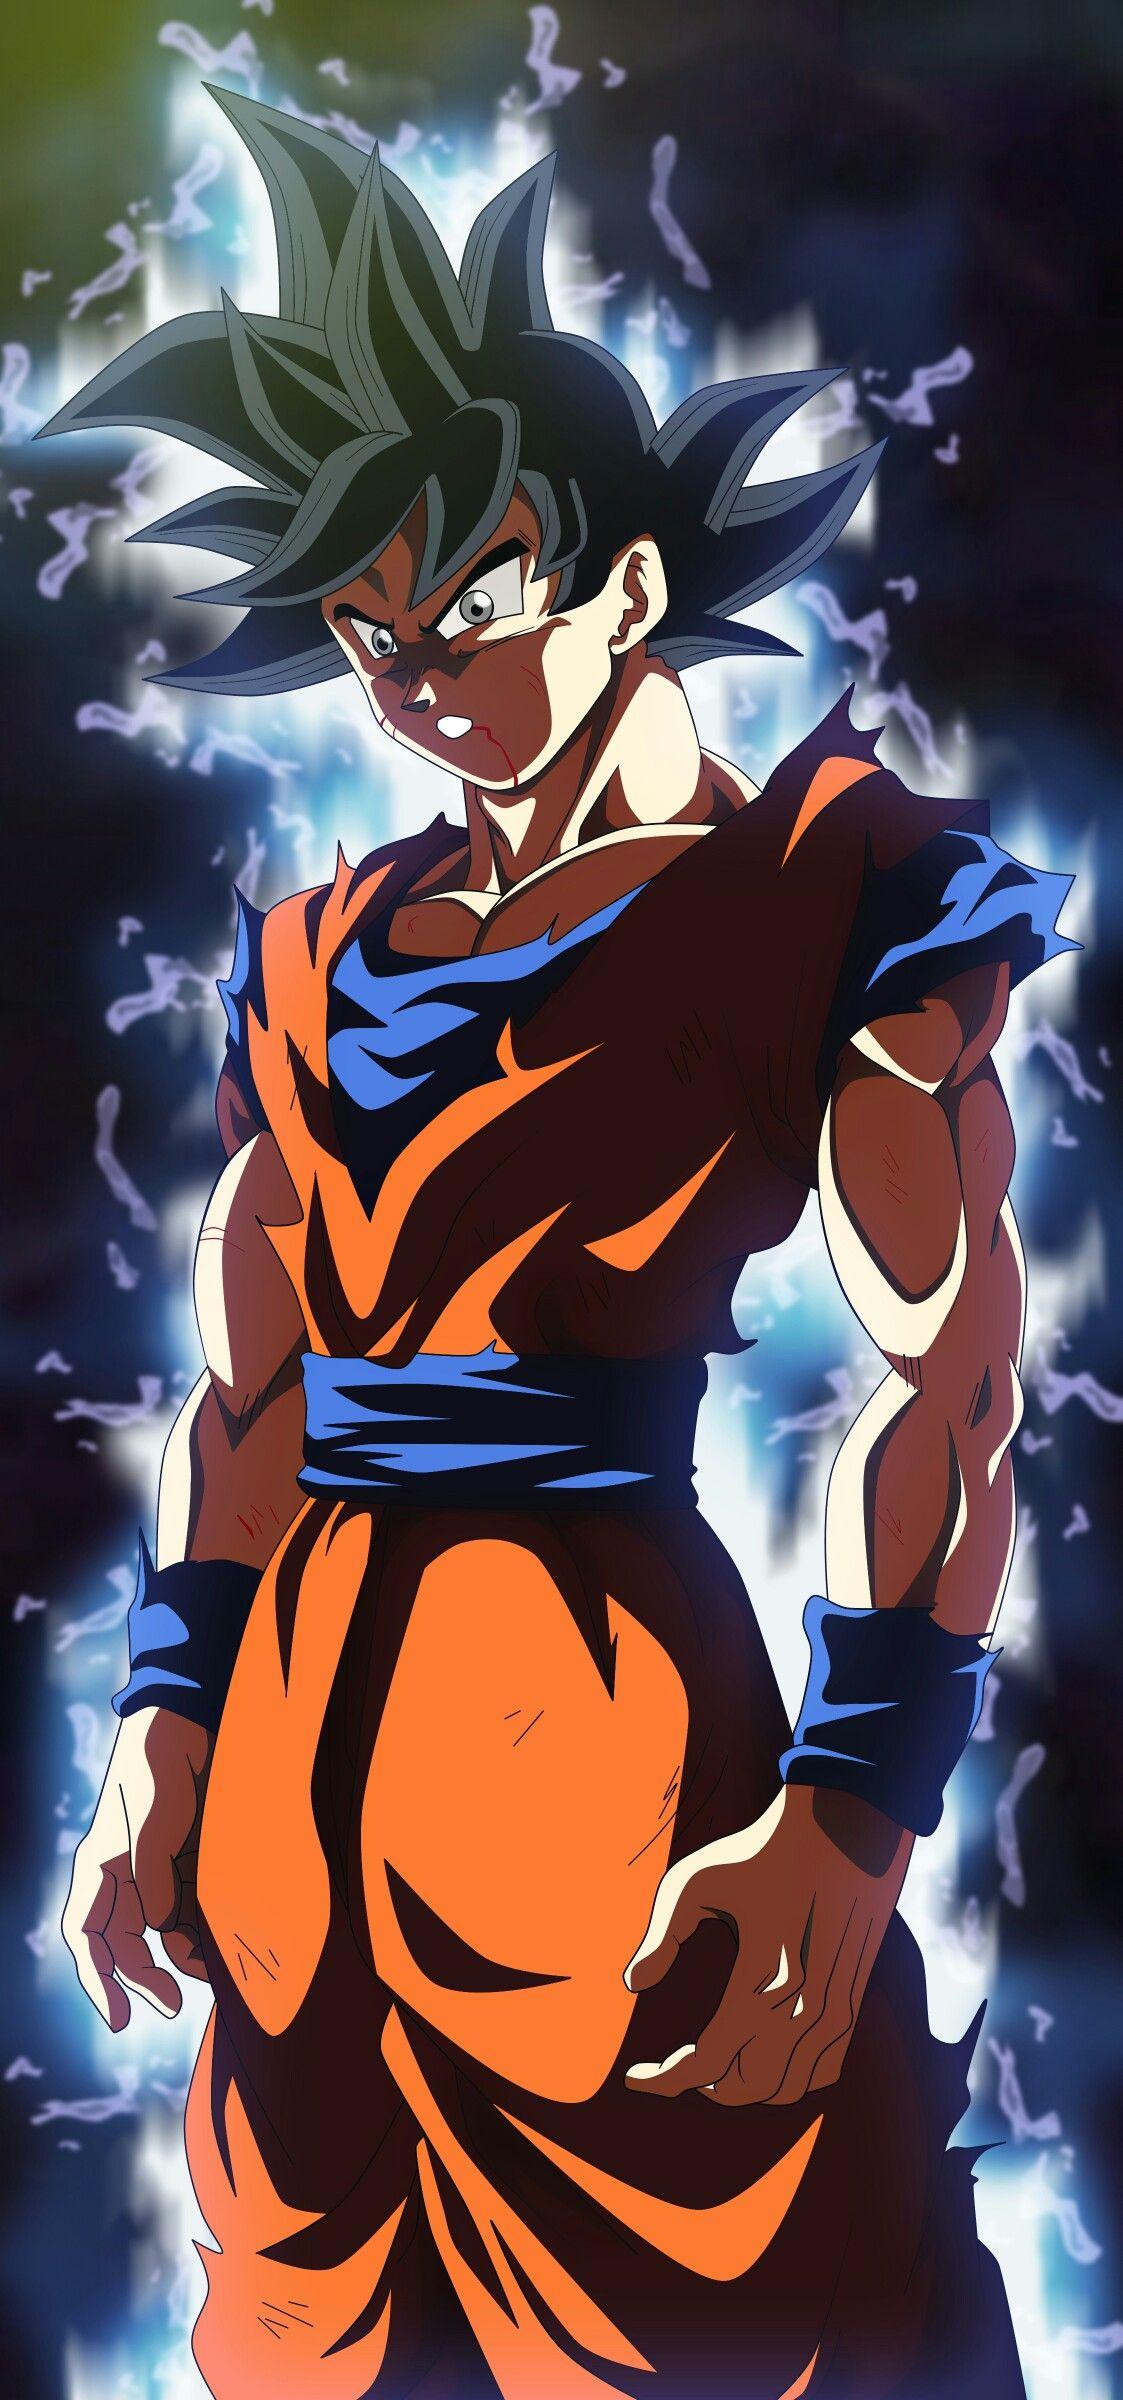 Goku Ultra Instinct Omen Manga Colored Anime Dragon Ball Super Dragon Ball Super Manga Dragon Ball Image